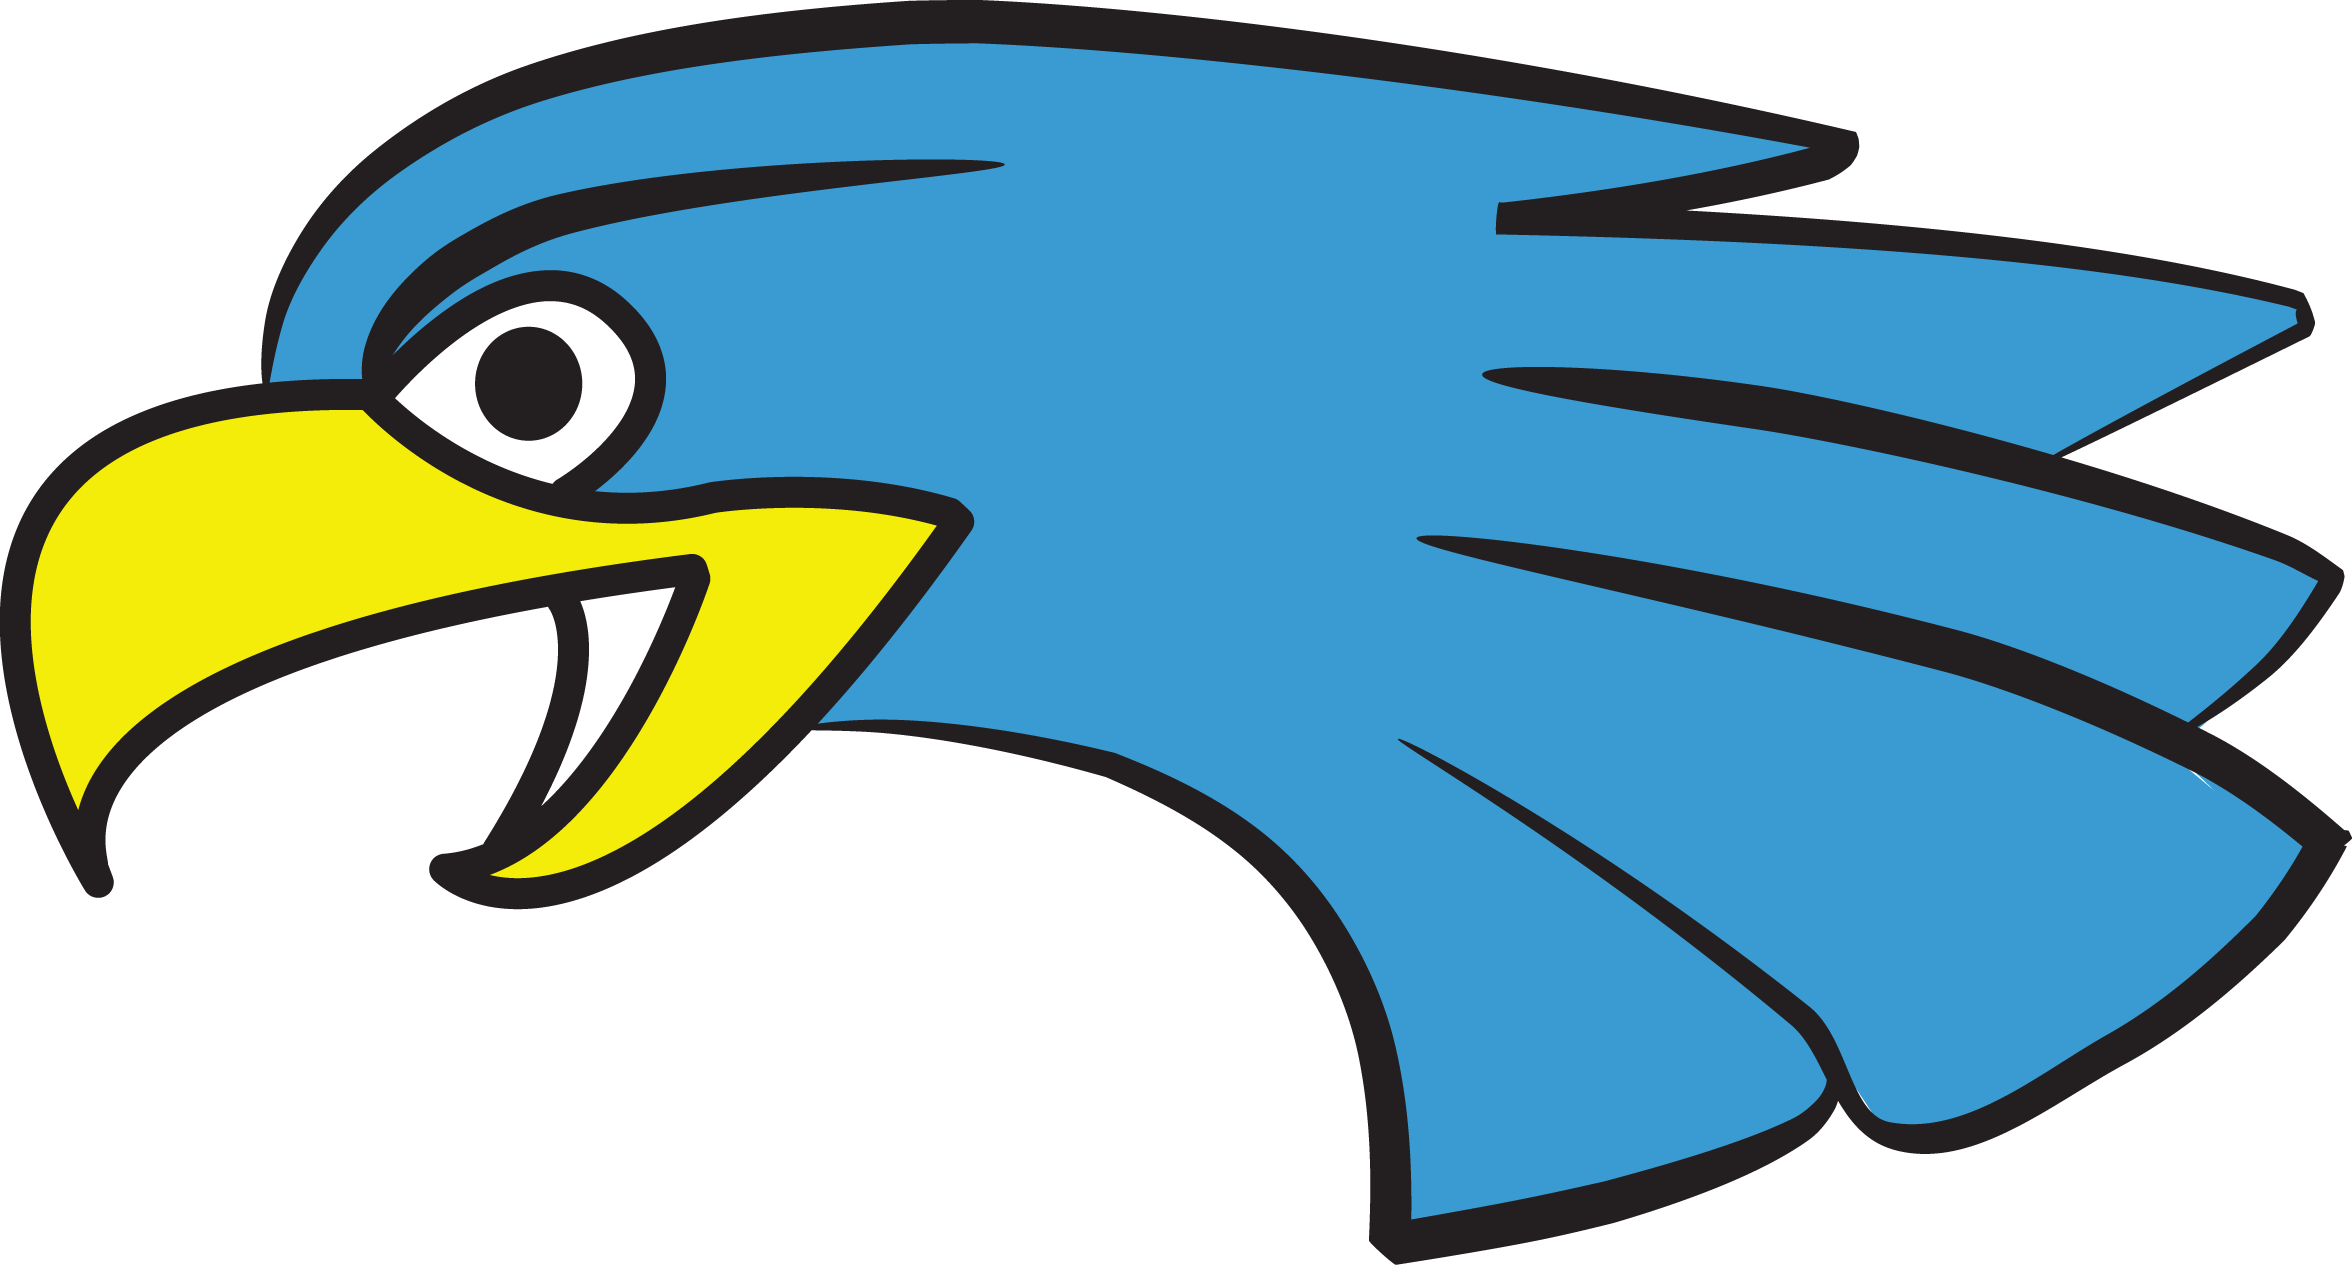 Eagles clipart eagle head. Wc hockey eaglehead